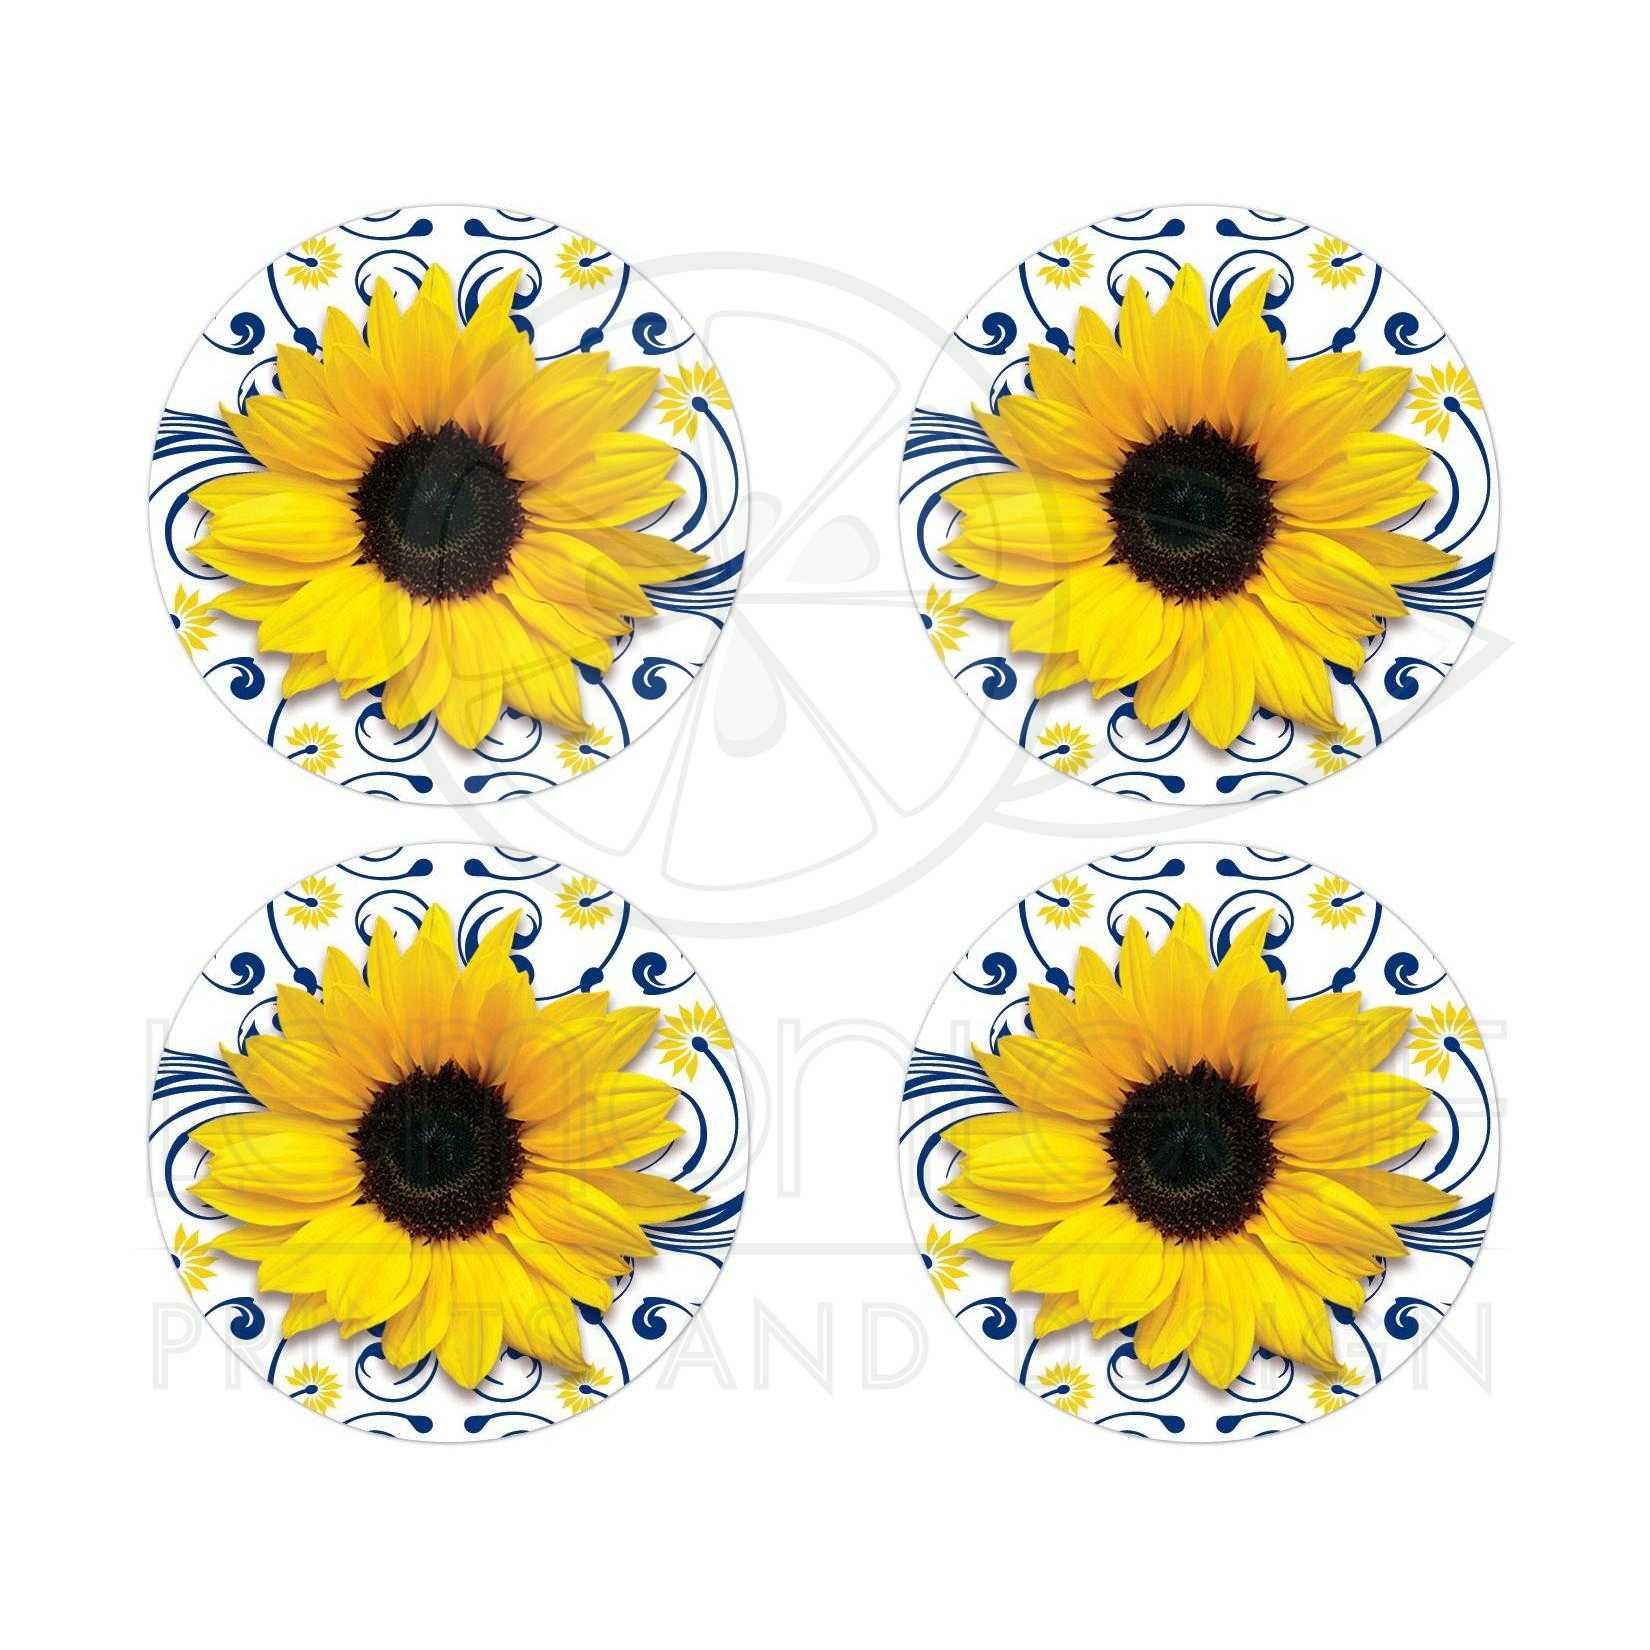 Navy Blue Yellow Sunflower Wedding Envelope Seals Or Stickers